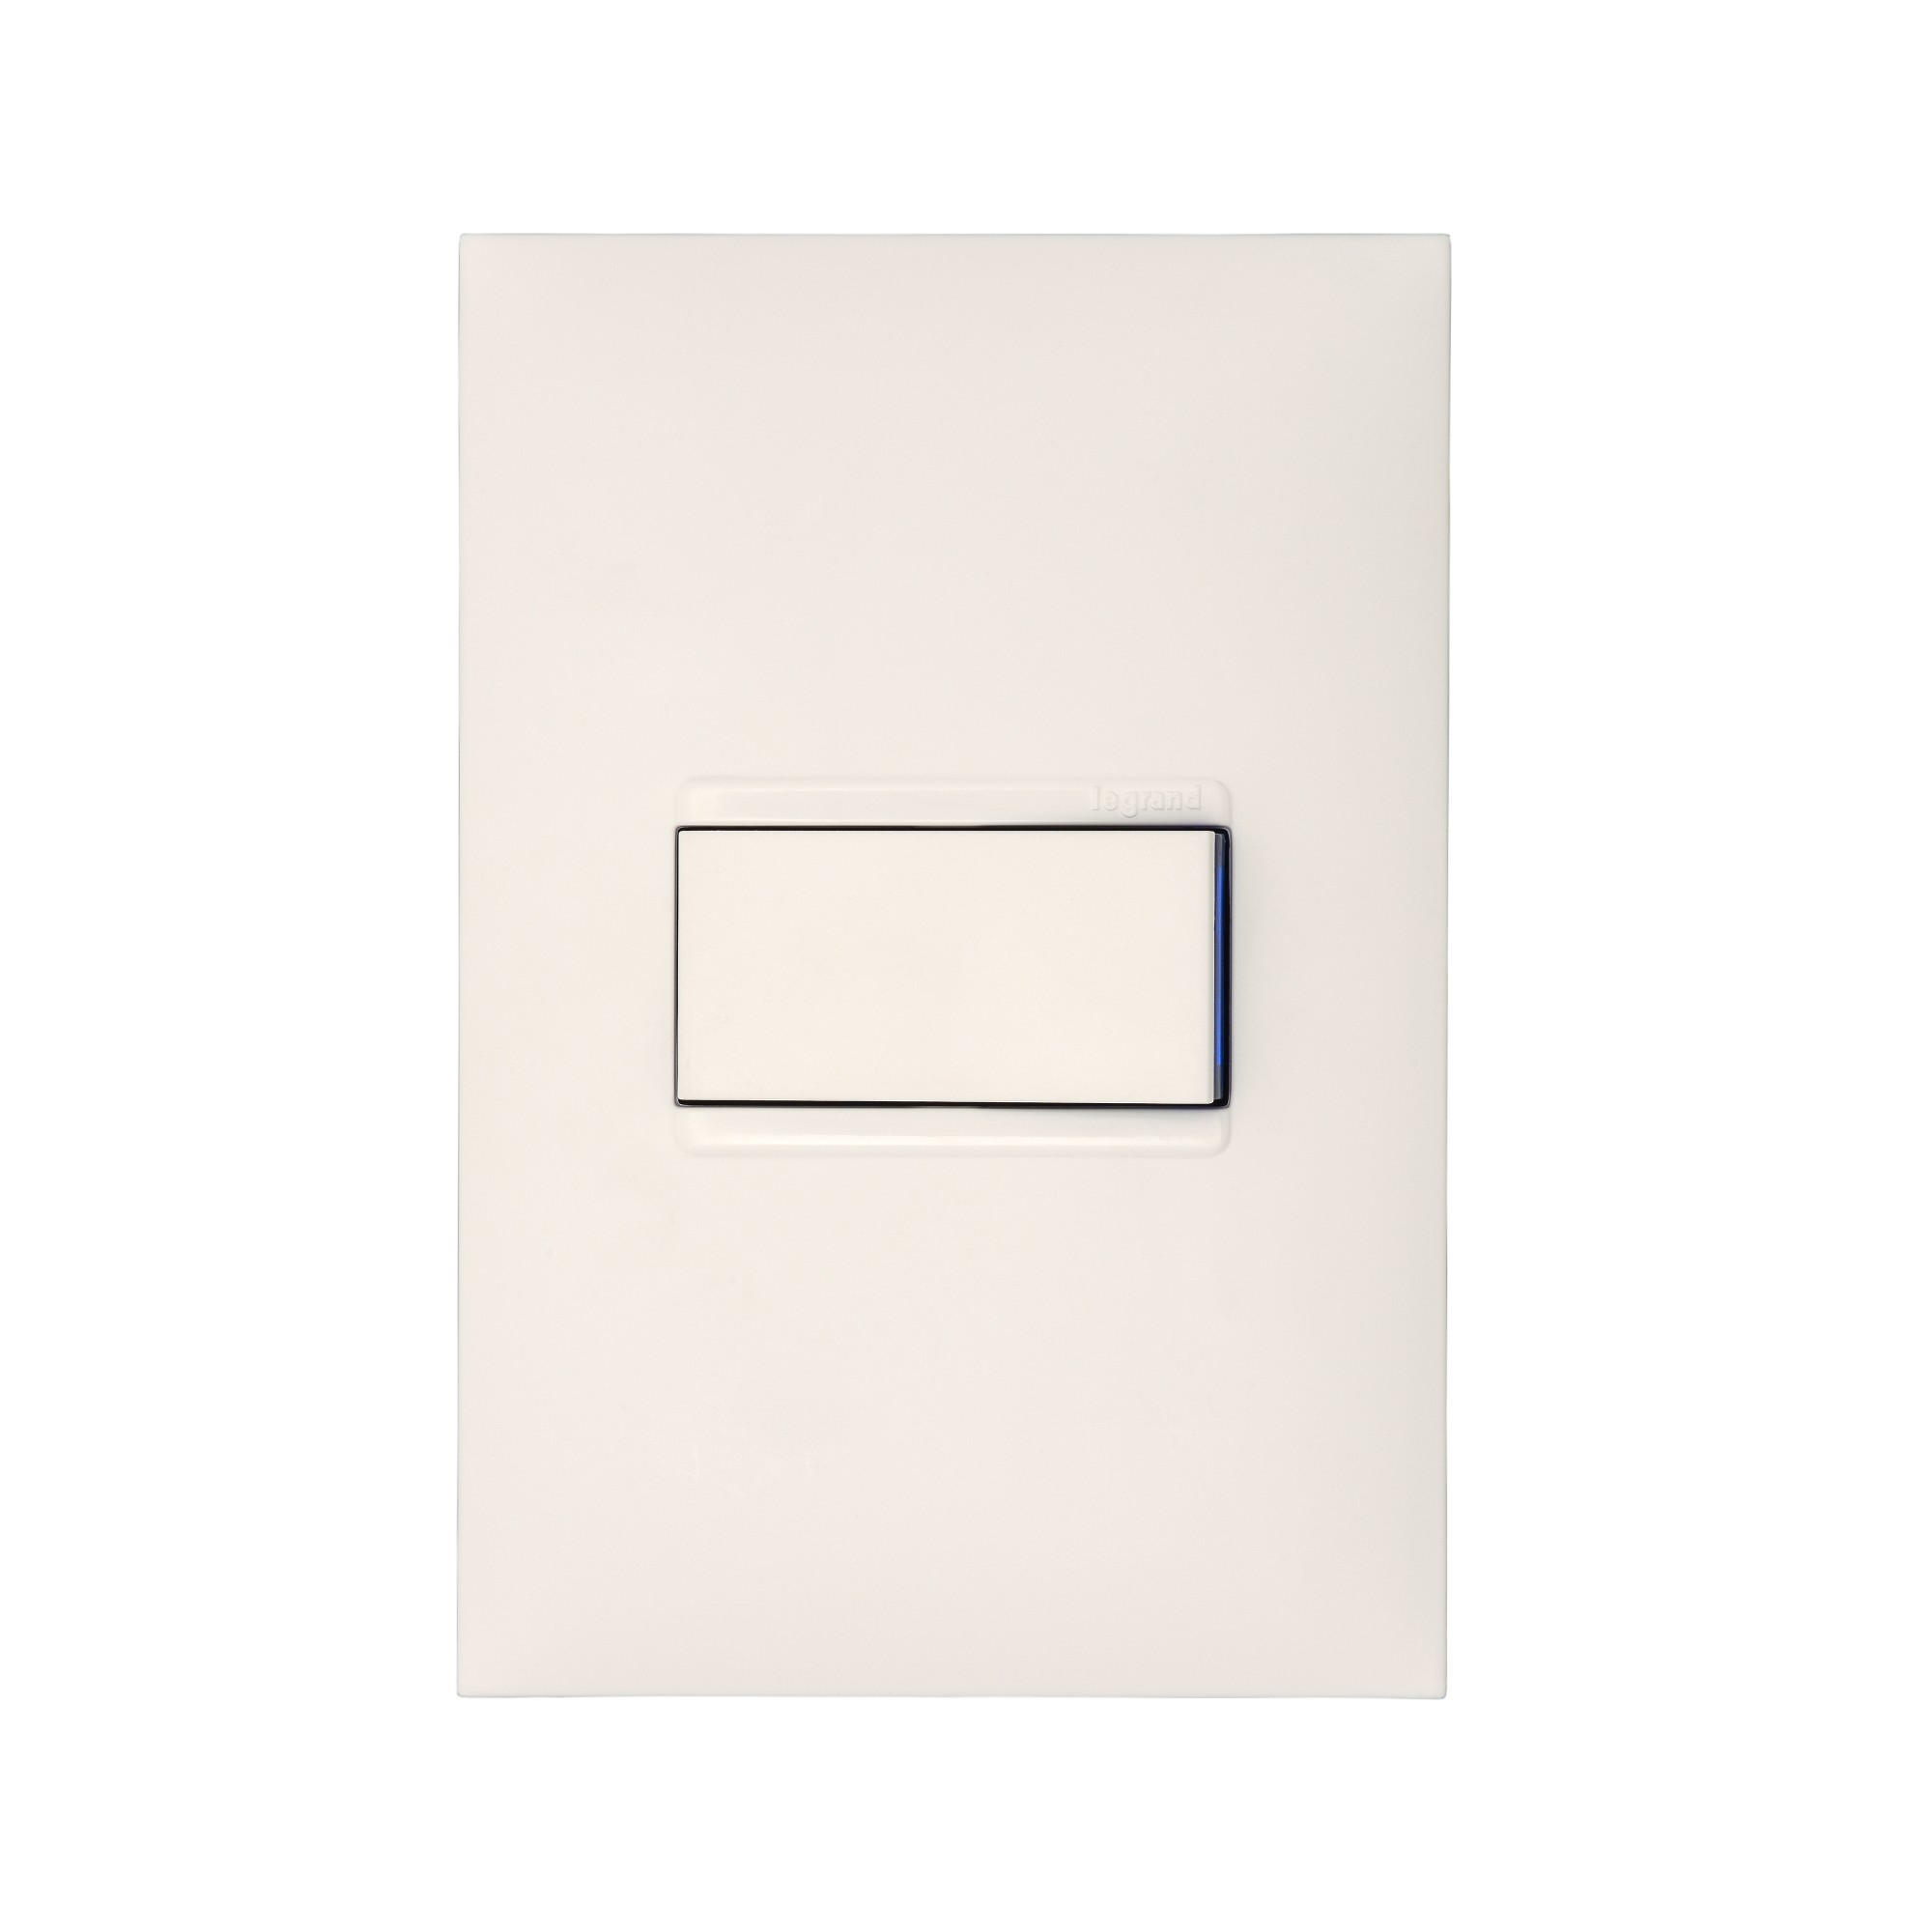 Conjunto Interruptor Simples 1 Modulo 10A - Branco - Plus - Legrand